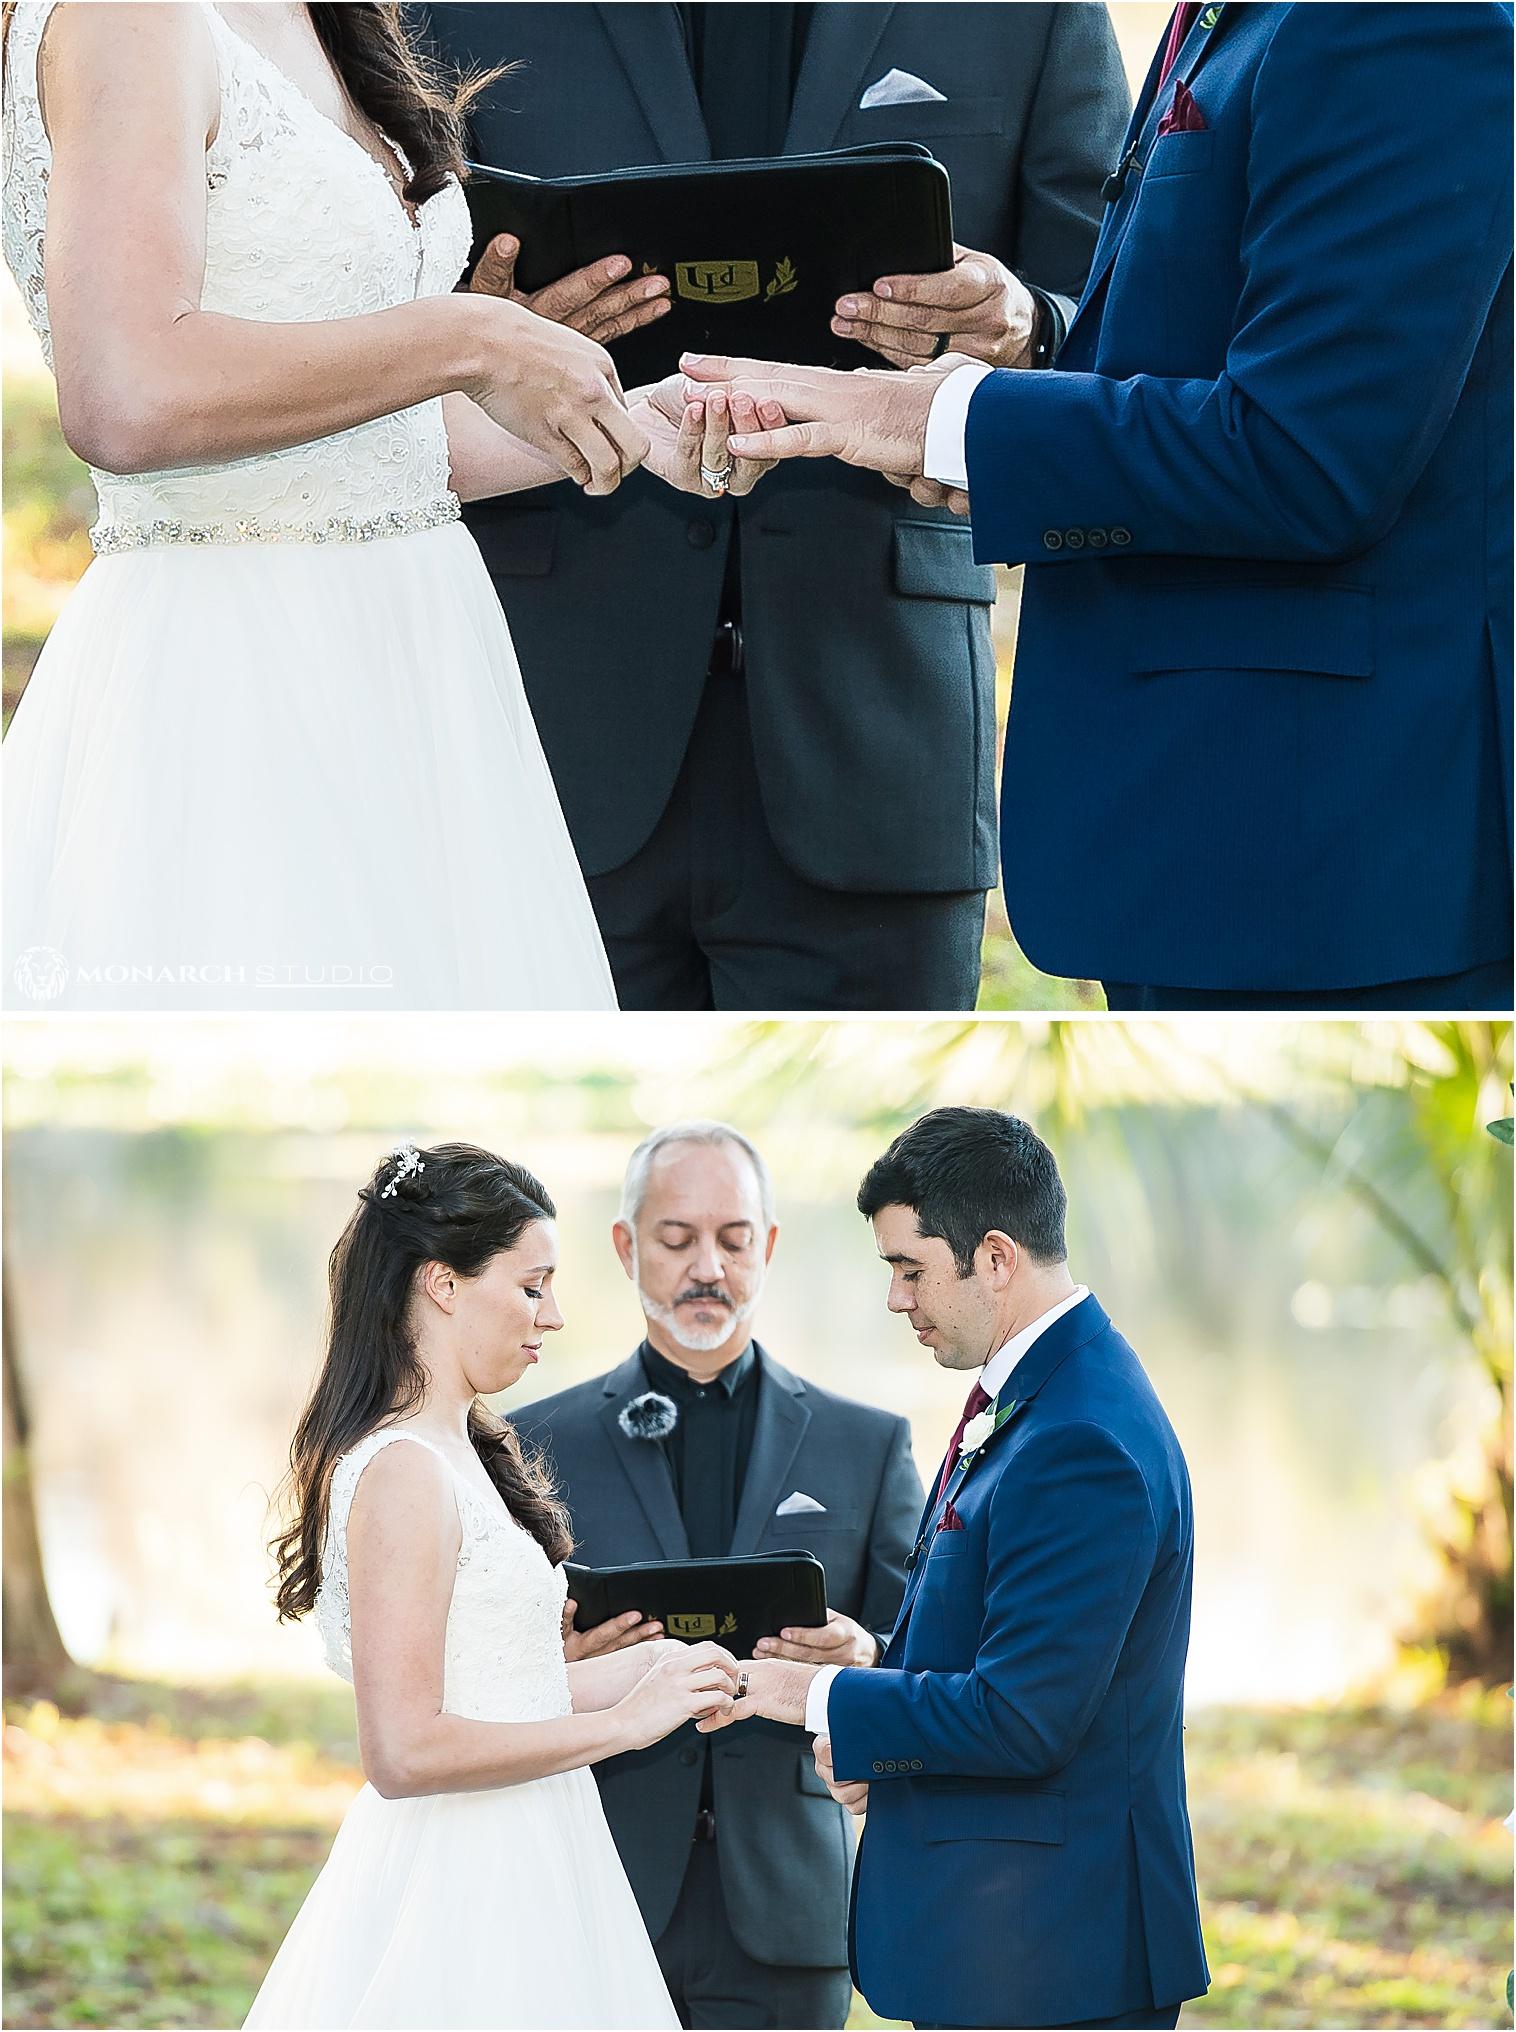 Wedding-photographer-in-sanford-florida-natural-wedding-061.jpg